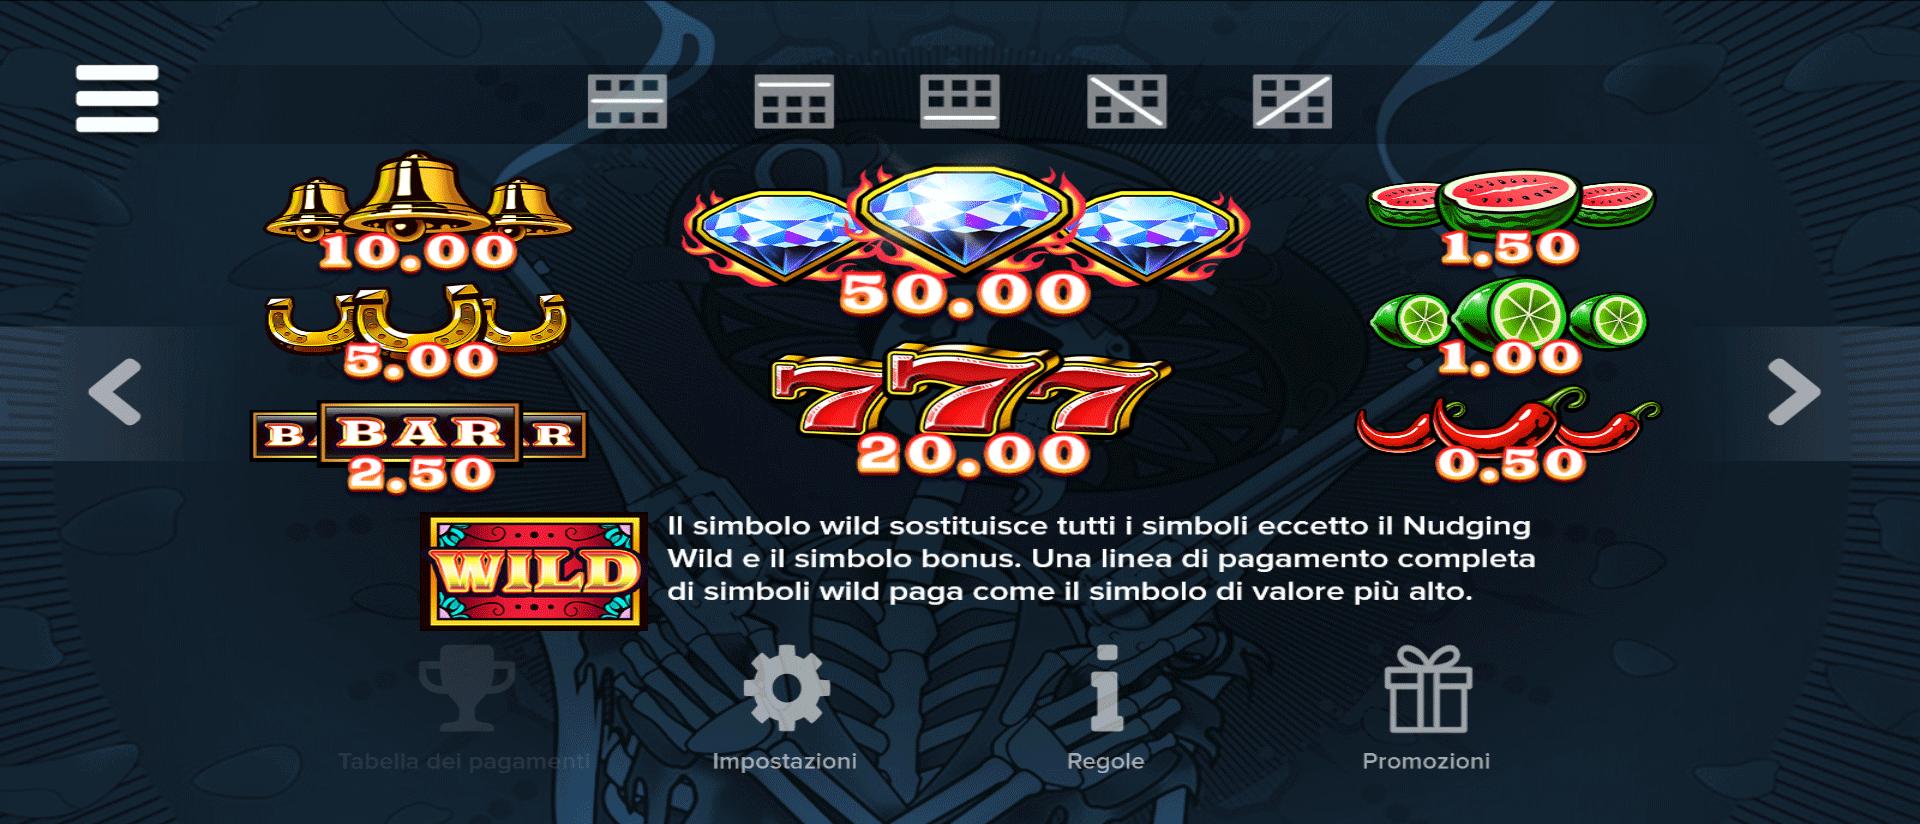 simboli del gioco slot online diablo reels